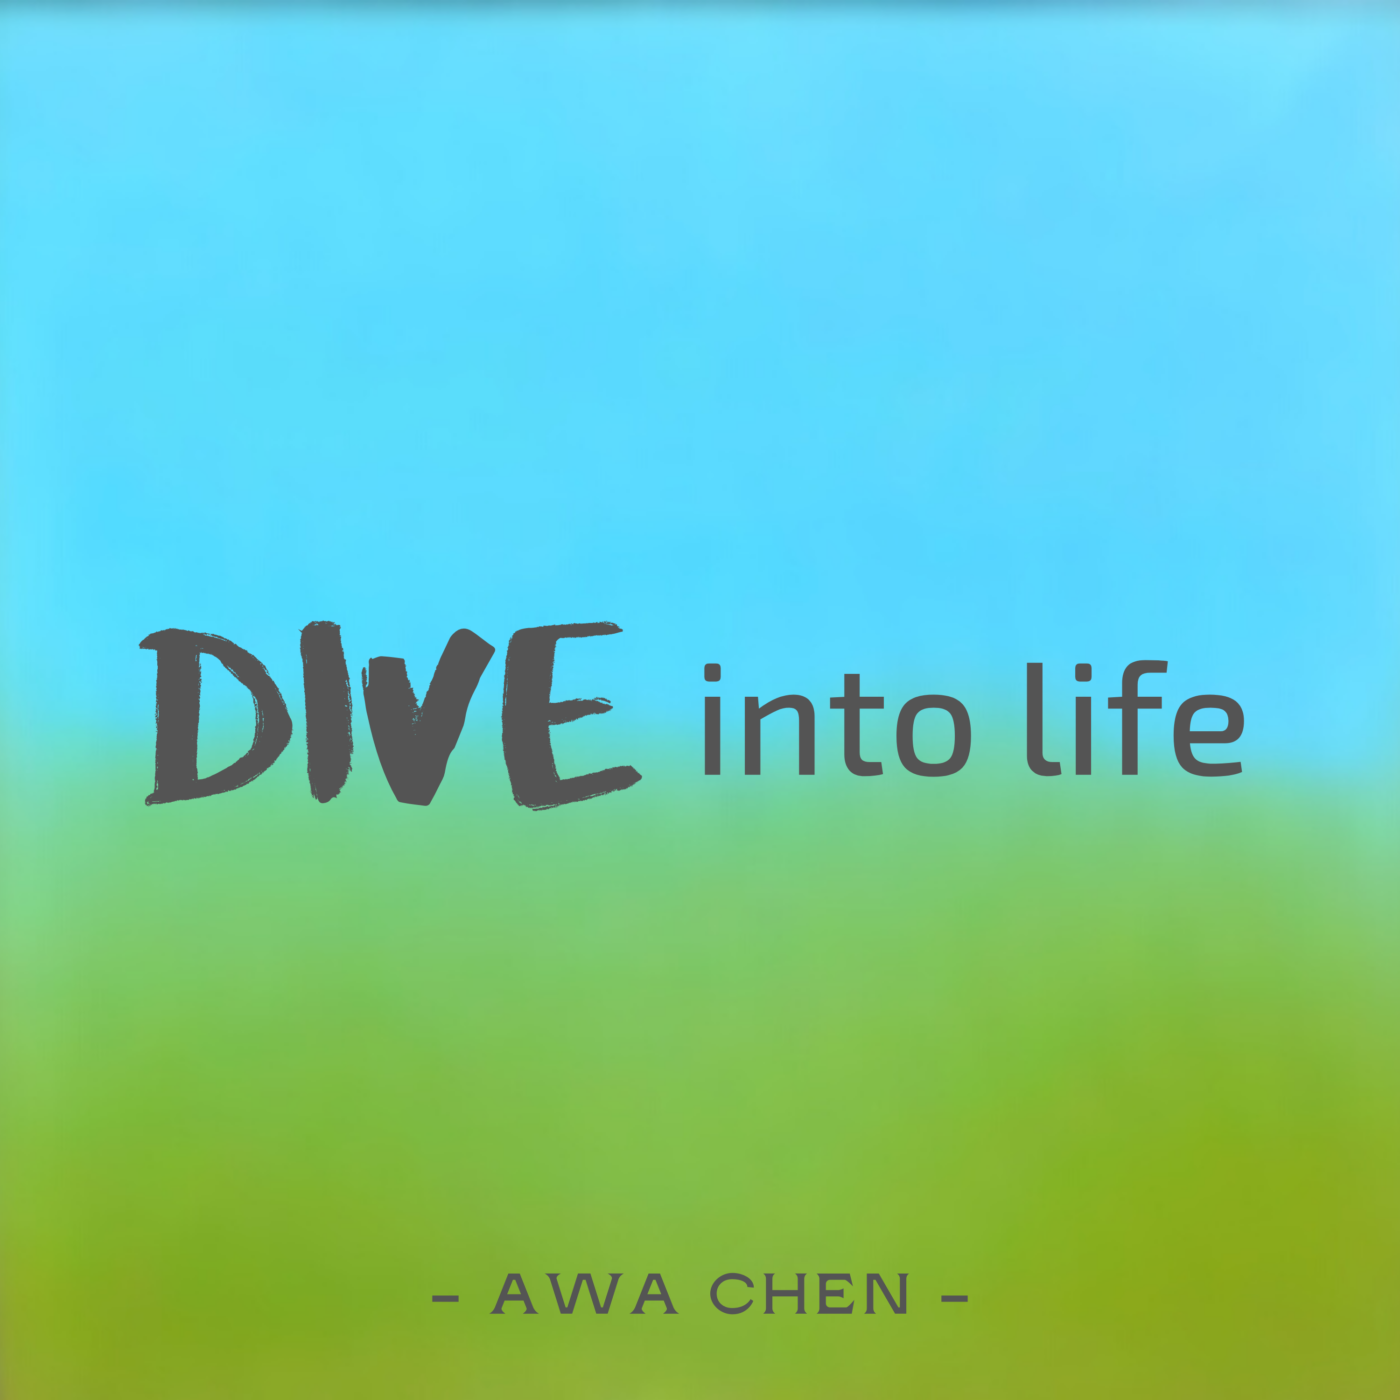 DIVE 9 潛水不能講話,那就把心情都轉化成文字傳遞出來吧 — 《潛水時不要講話》作者栗光